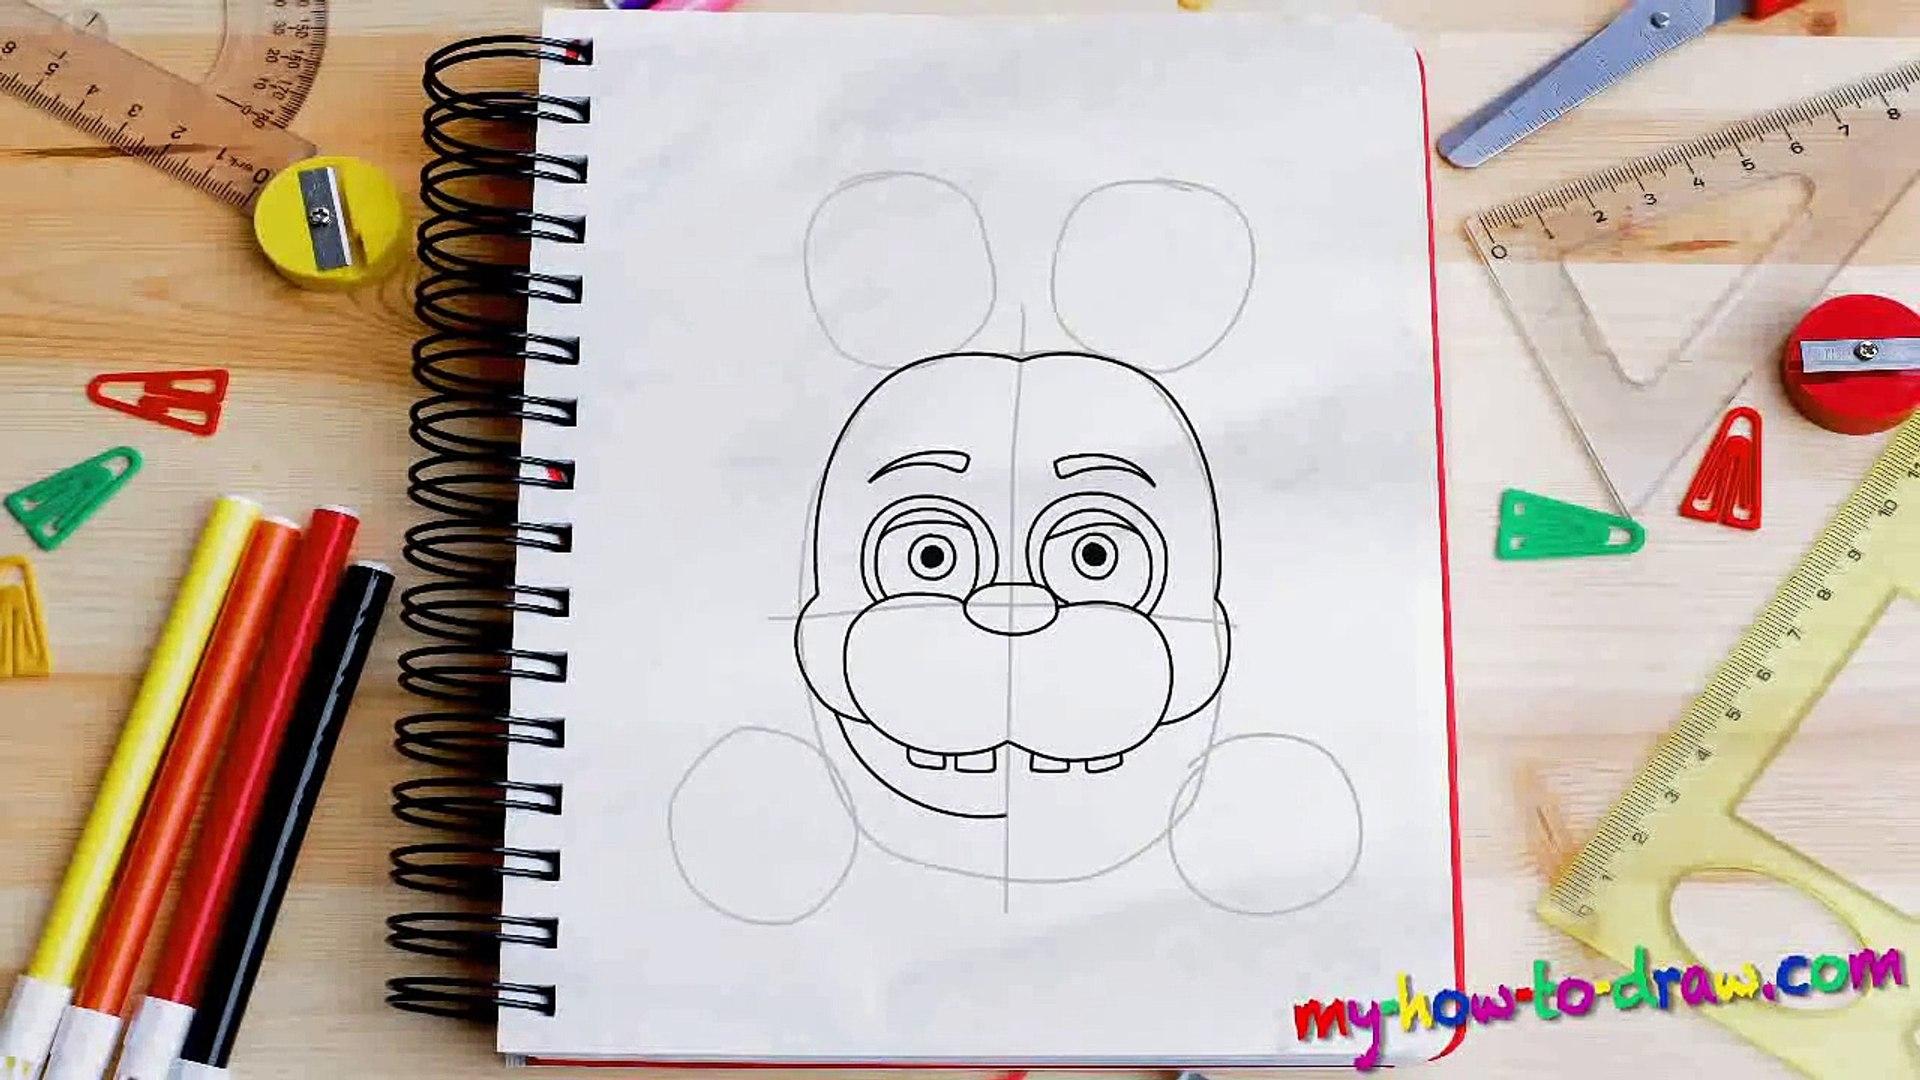 Fnaf 2 Drawings drawing tutorial fnaf how to draw bonnie